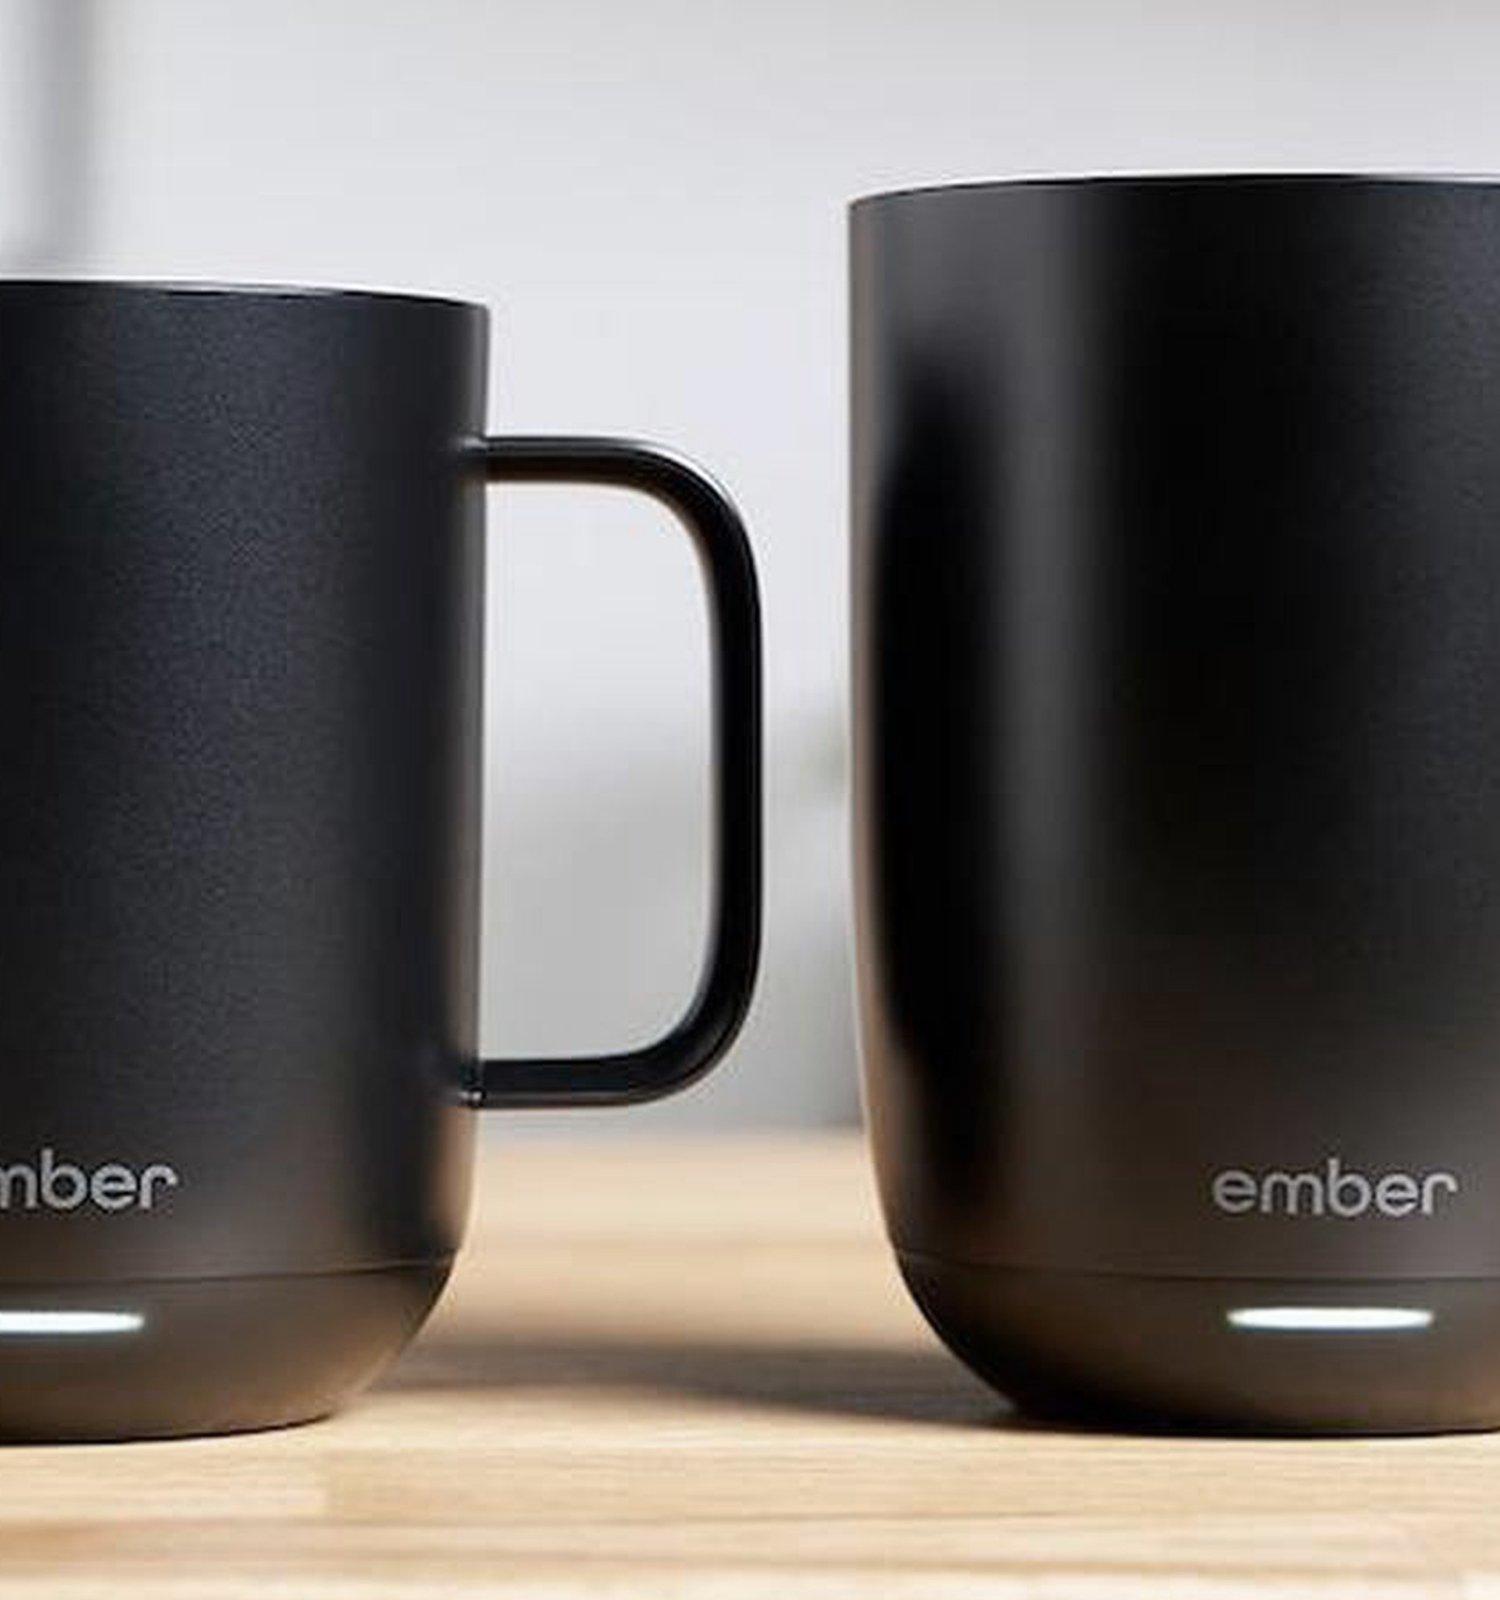 ember product mug